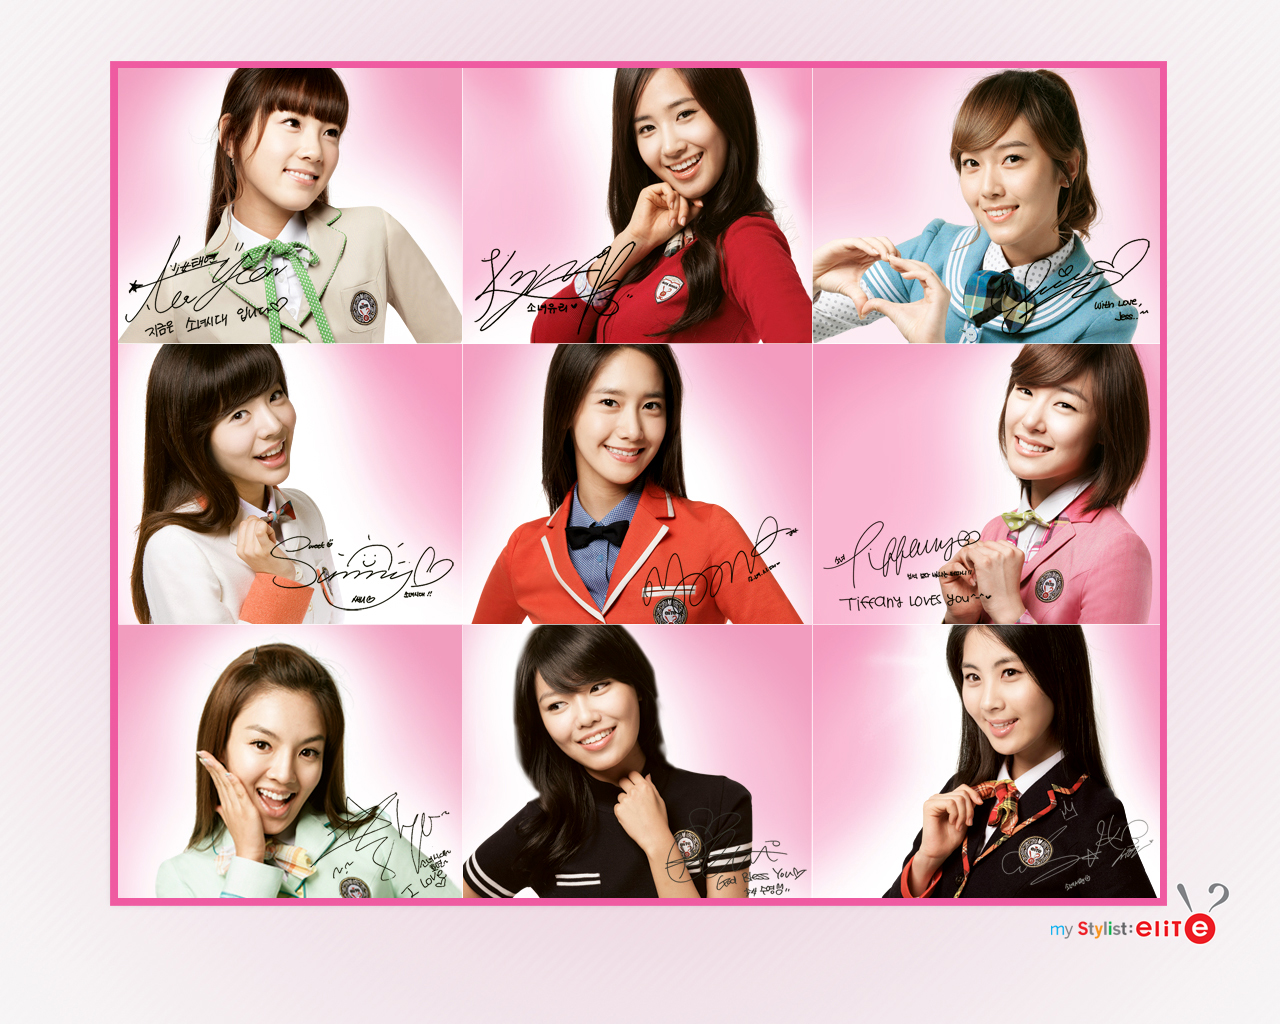 ec868ceb8580ec8b9ceb8c80-girls-generation-elite-advertisement-eab491eab3a0